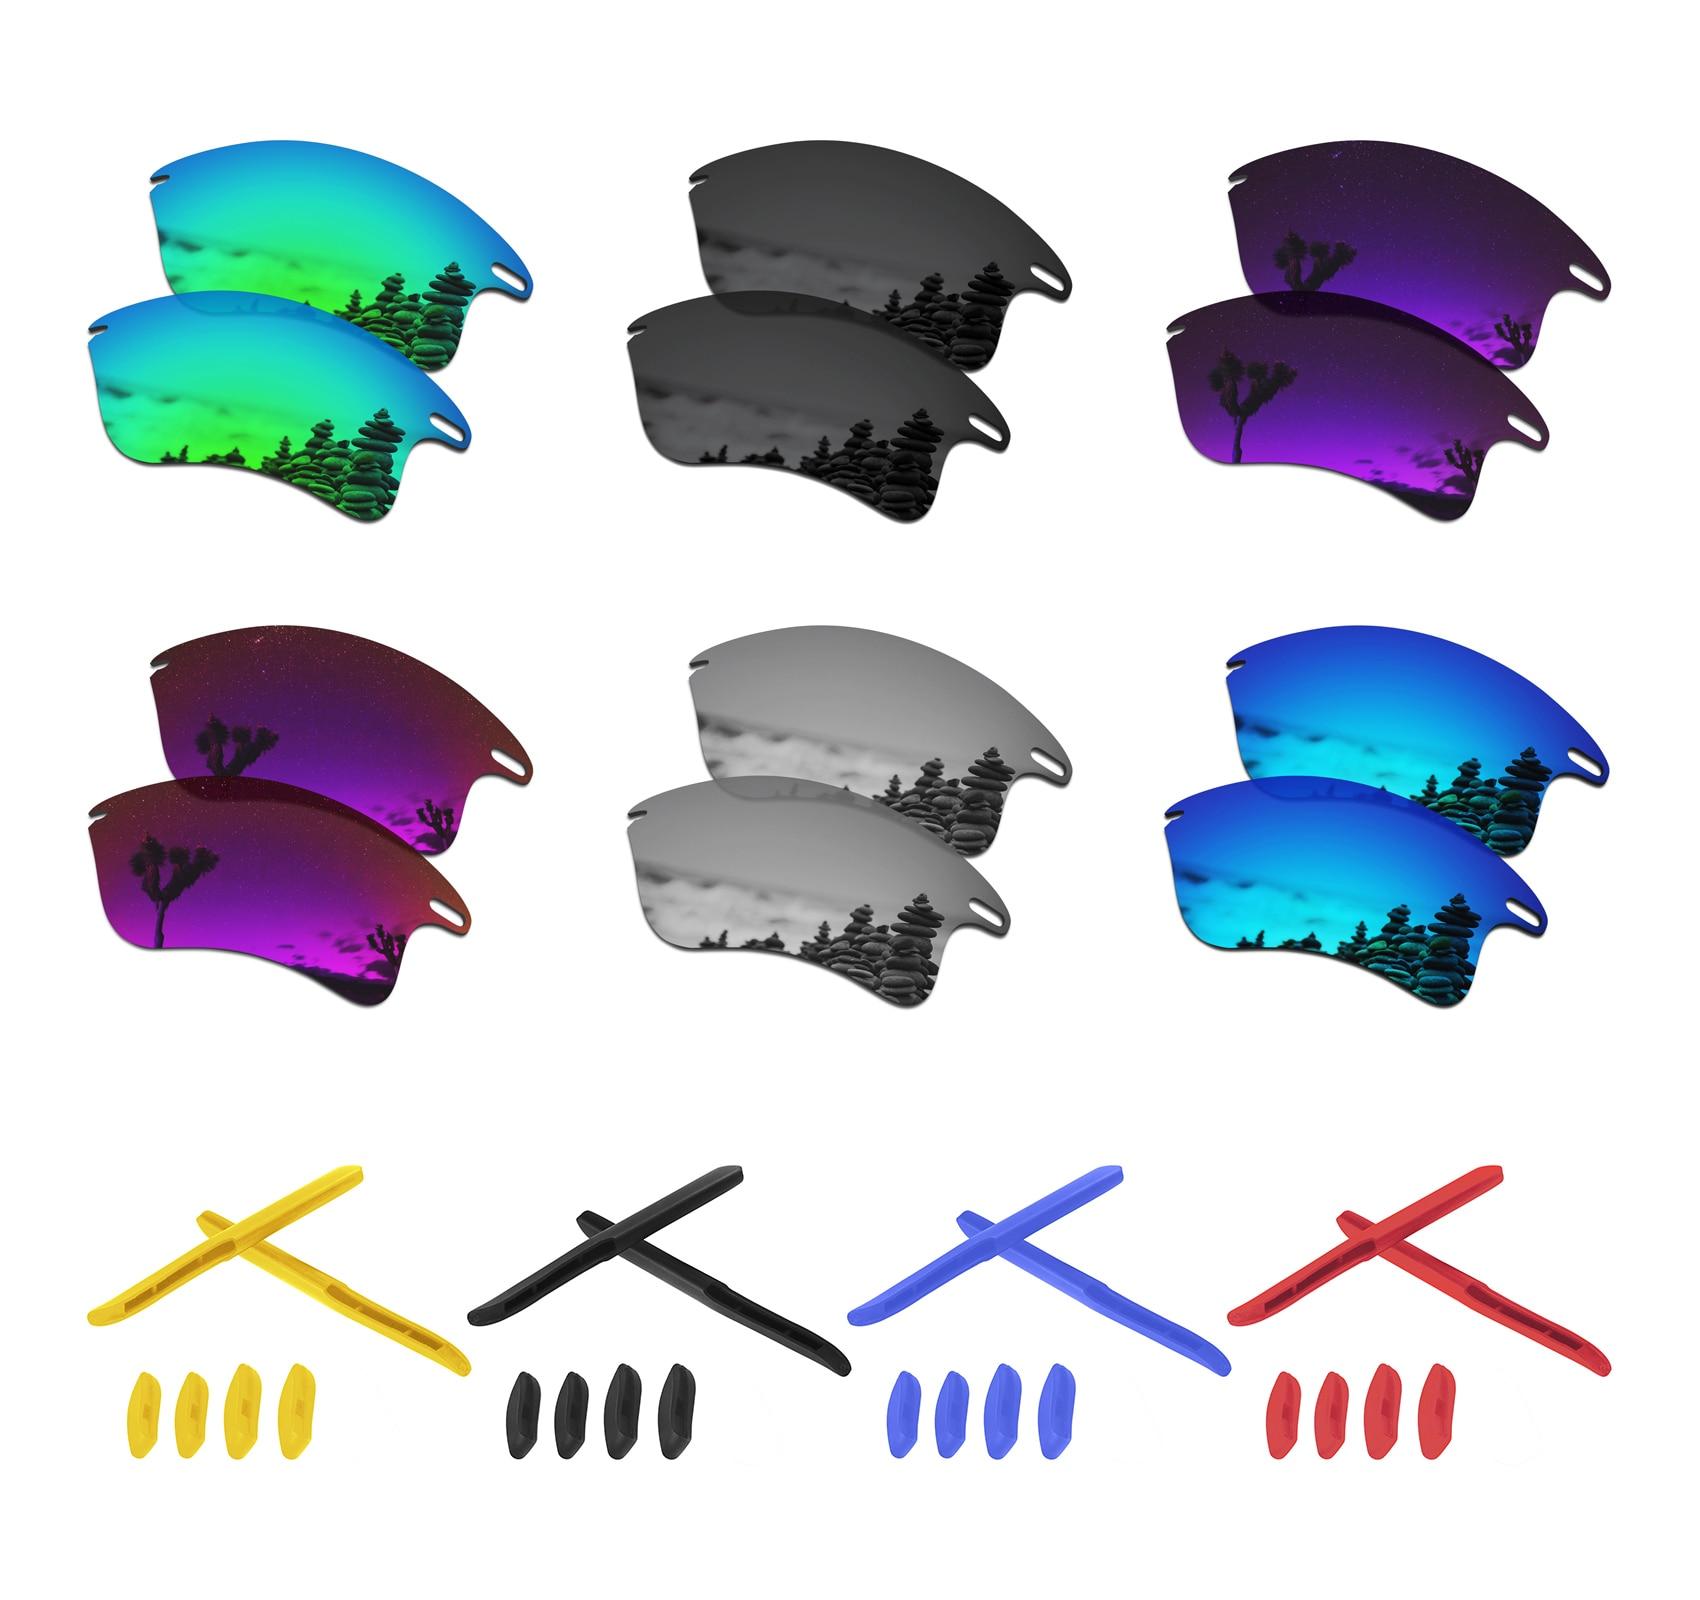 SmartVLT Polarized Replacement Lenses For Oakley Fast Jacket XL Sunglasses - Multiple Options